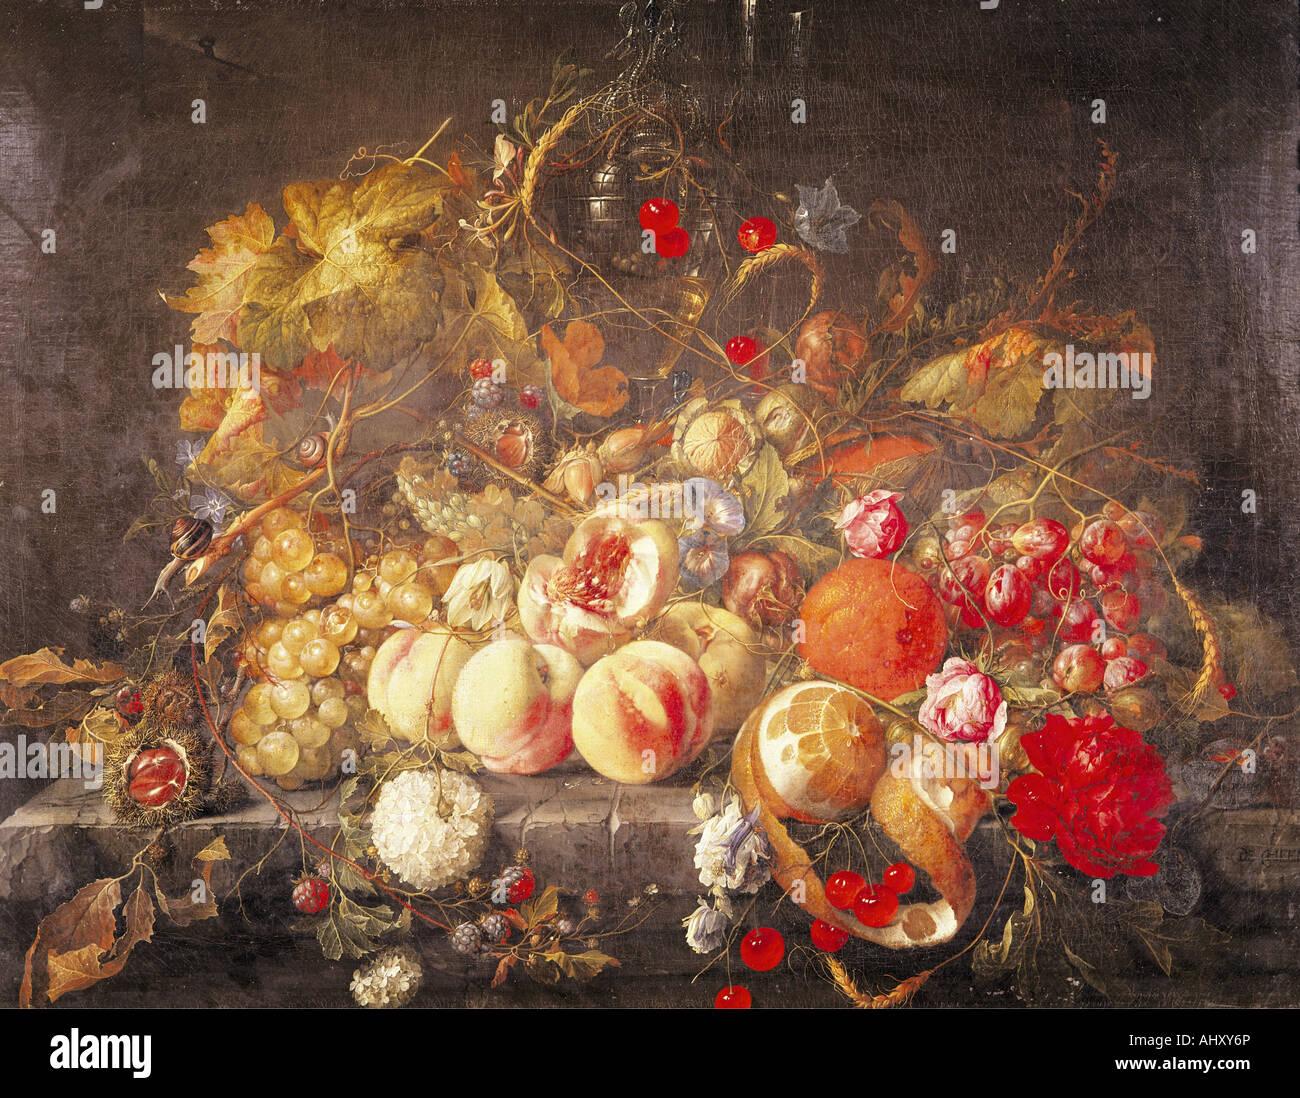 """Belle Arti, Heem, Jan Davidsz de, (1606 - 1684), pittura, 'Still' vita, olio su pannello, 55,8 cm x 73,5 cm, museo Foto Stock"